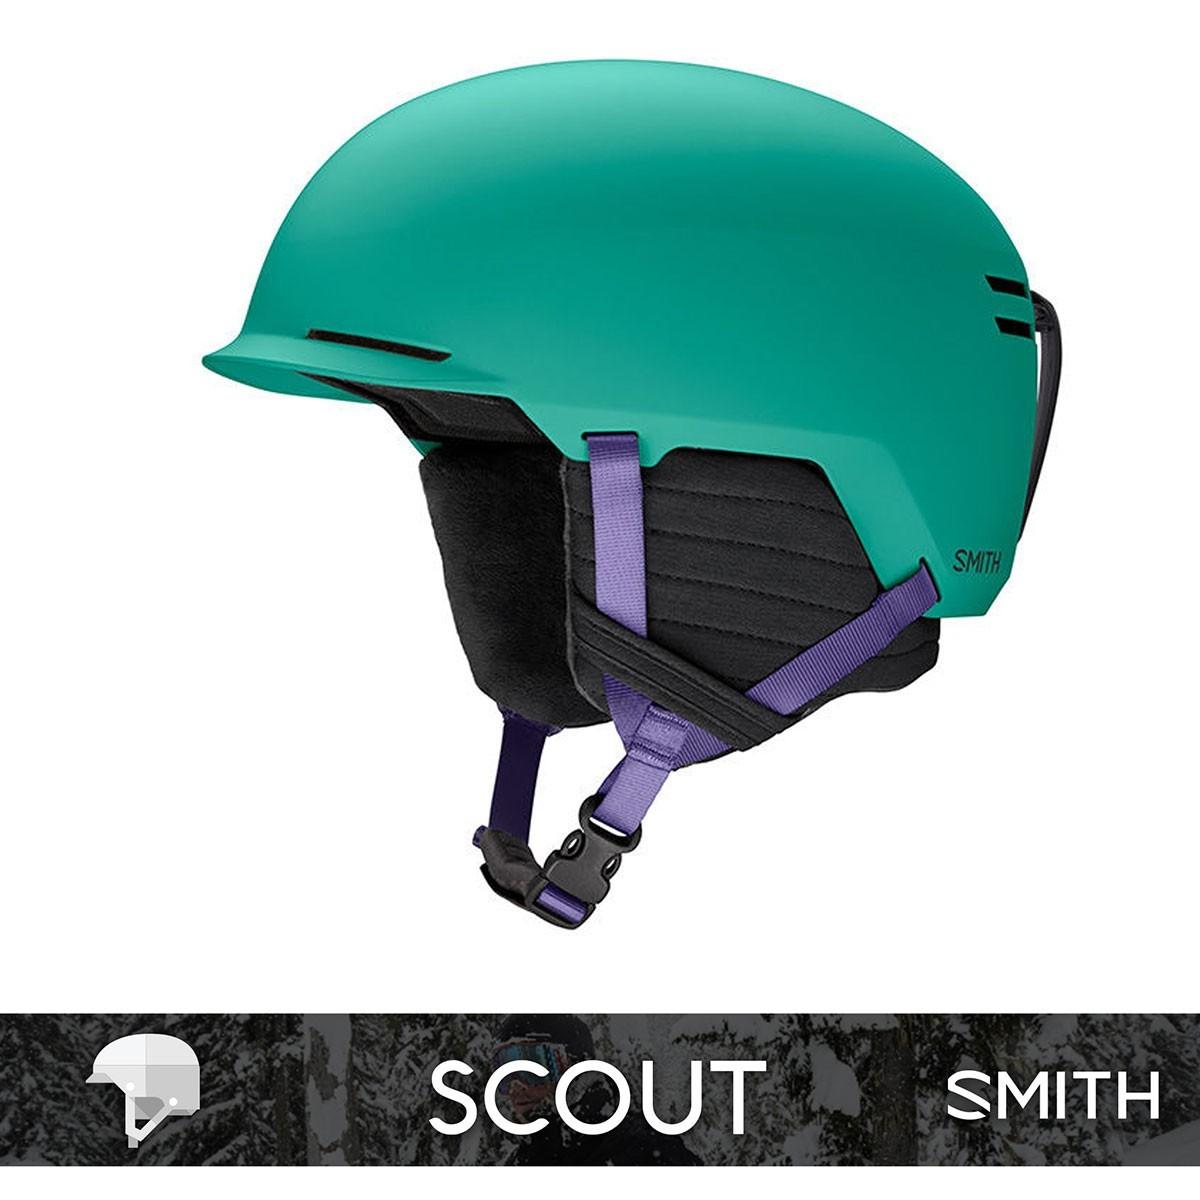 SMITH SCOUT matte Jade Block - Изображение - AQUAMATRIX